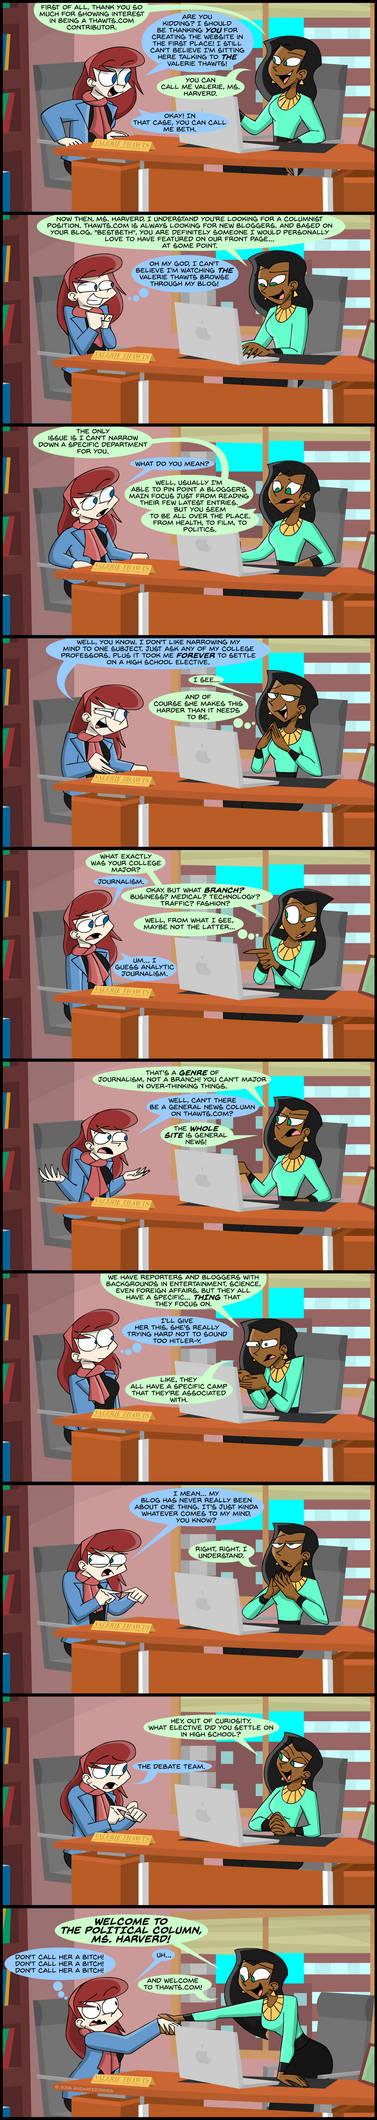 Thawts by AnimatedJames